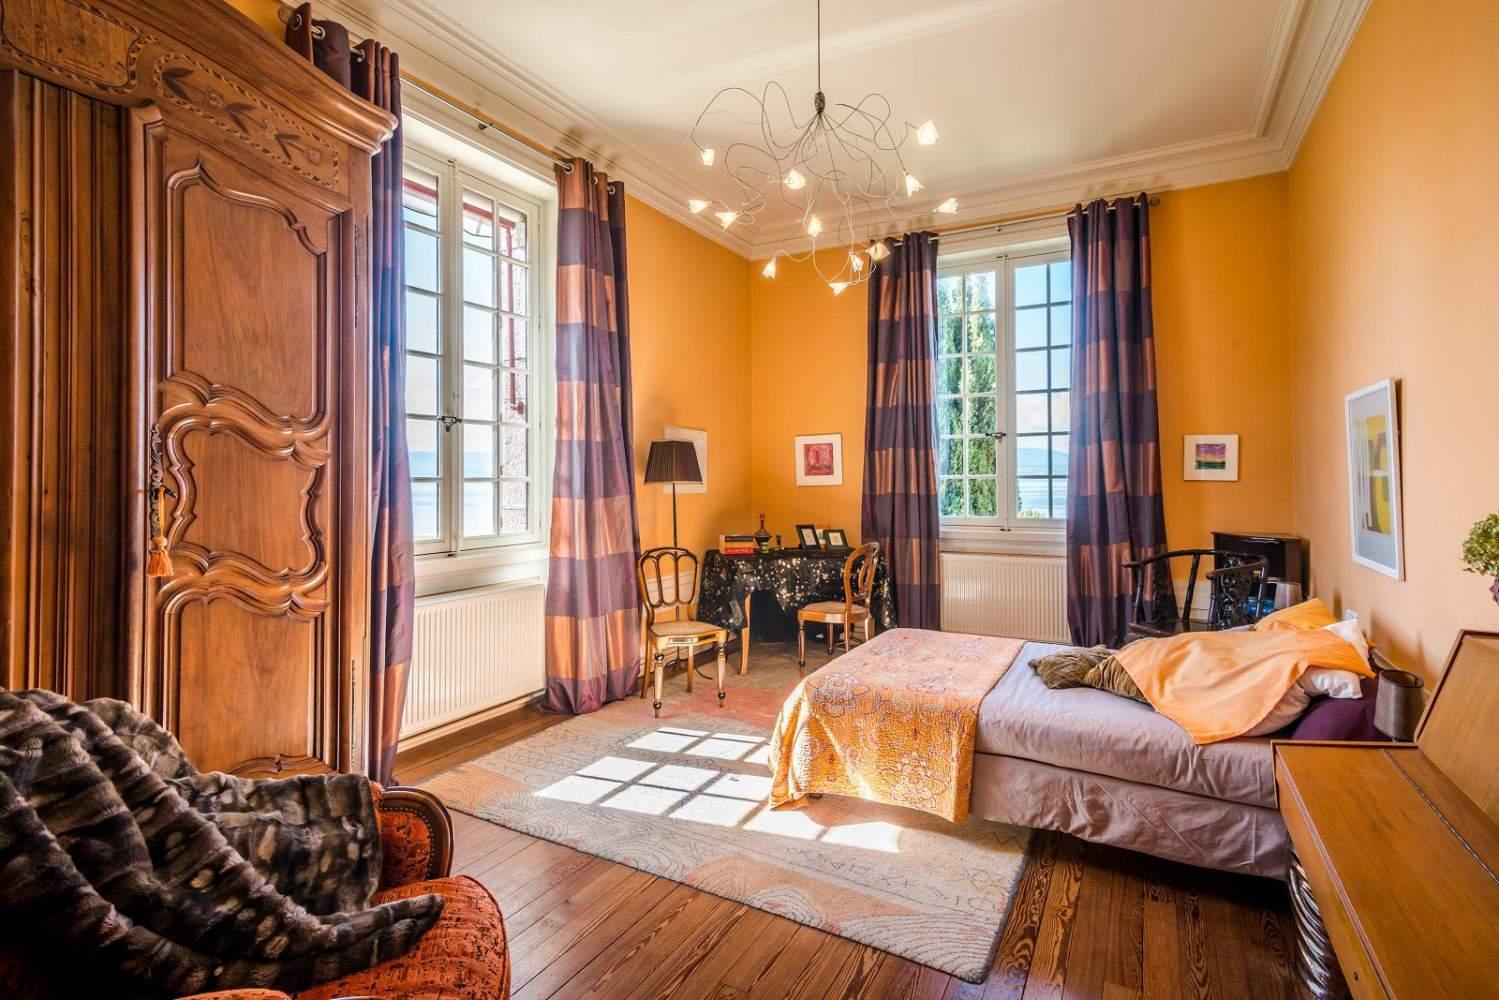 Thonon-les-Bains  - Casa 16 Cuartos 10 Habitaciones - picture 12